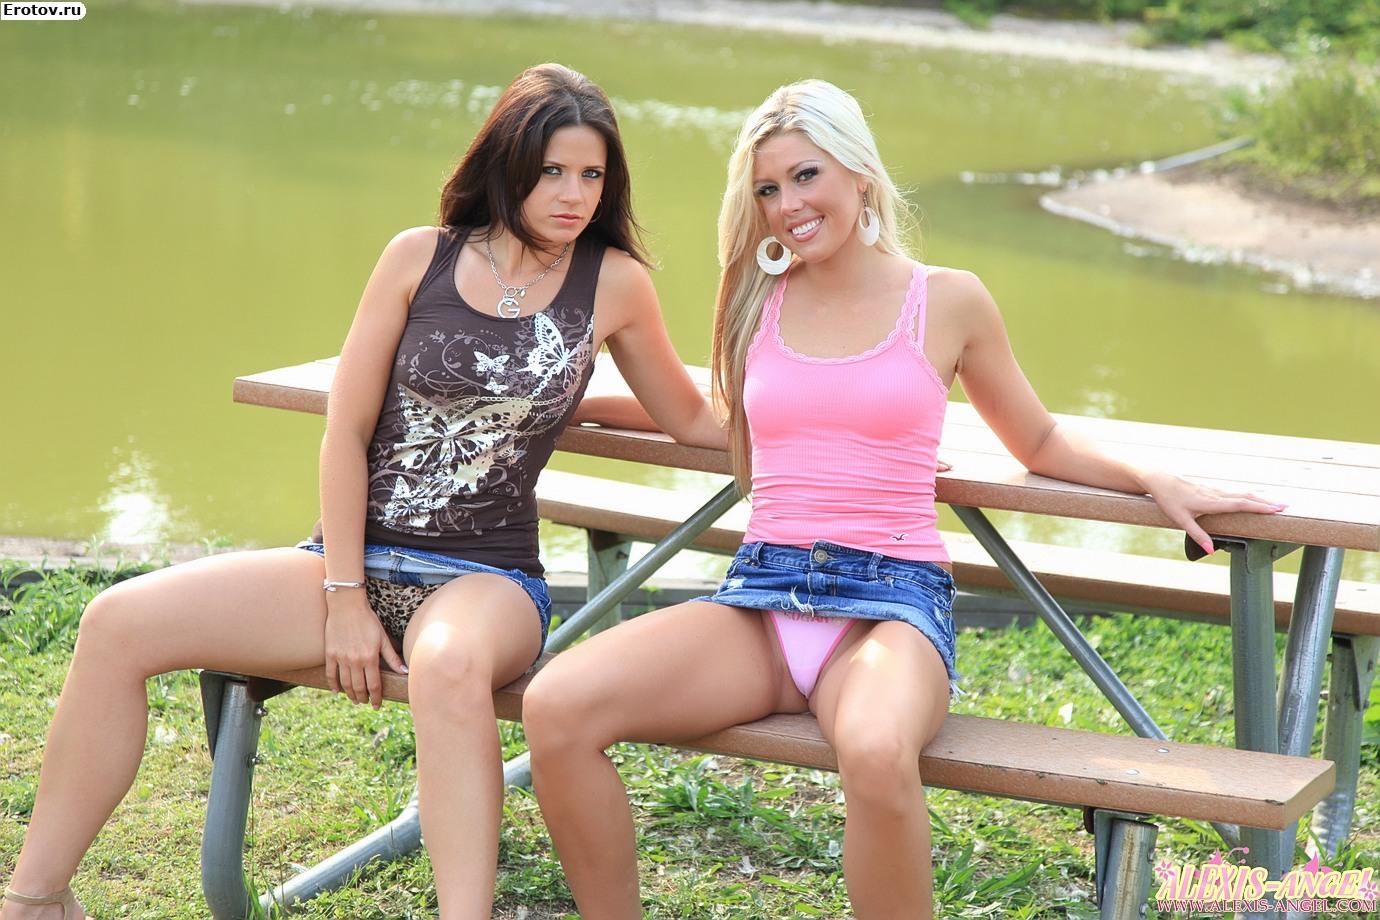 Трусики засветы сидя на скамейке